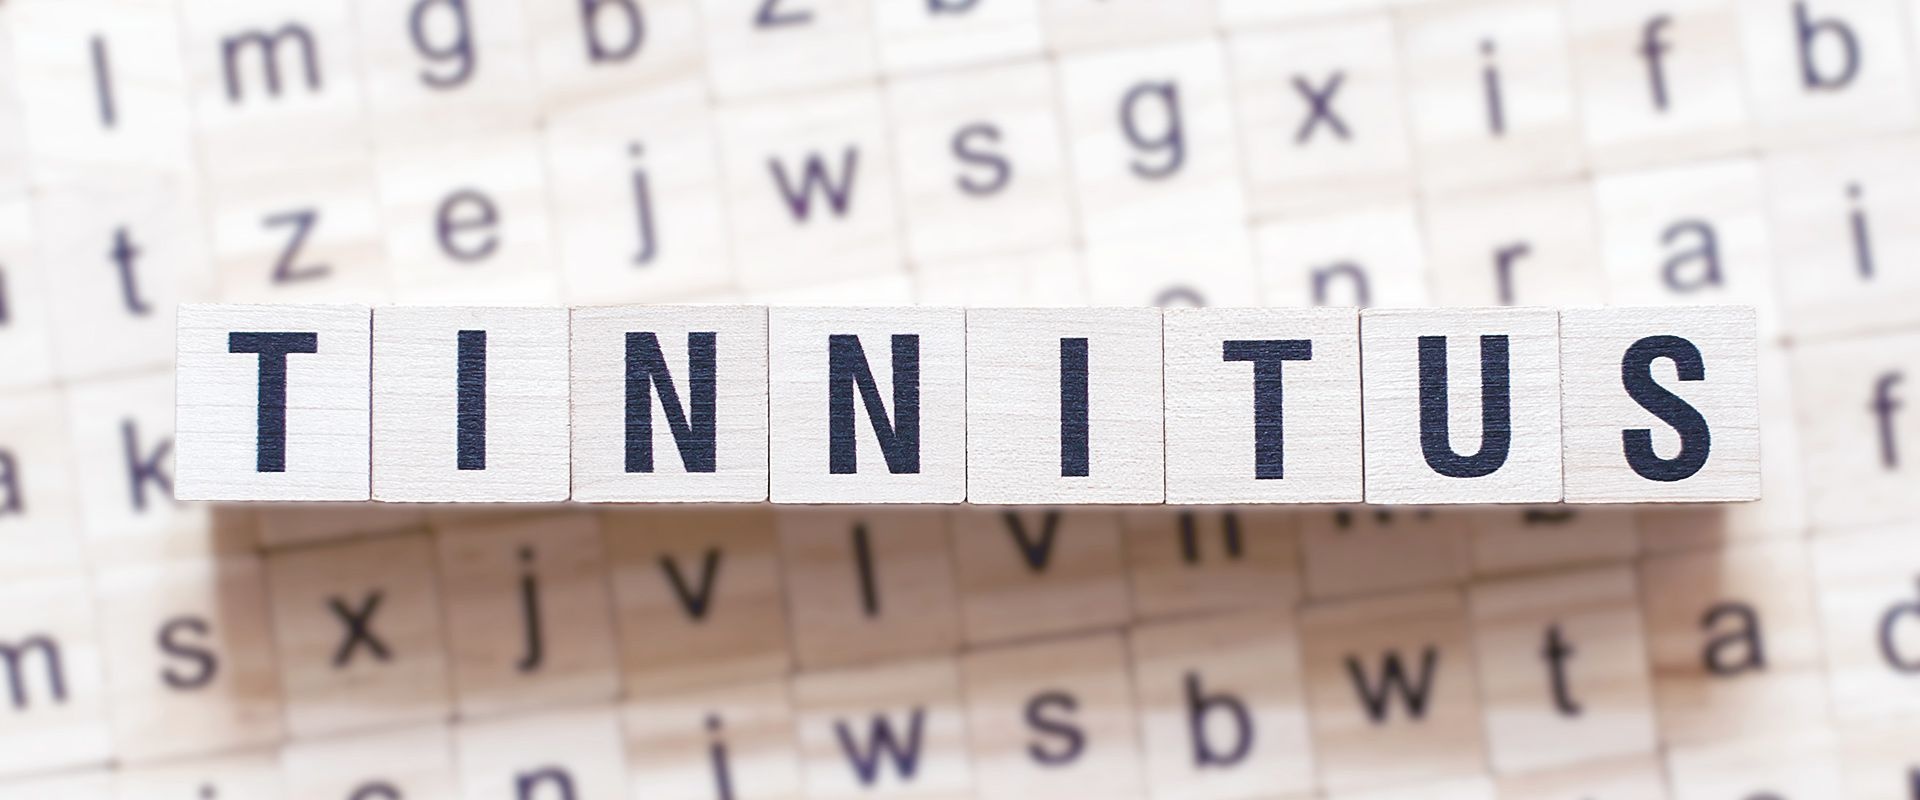 TINNITUS TIROL - Selbsthilfegruppe - Holzwürfel als Tinnitus